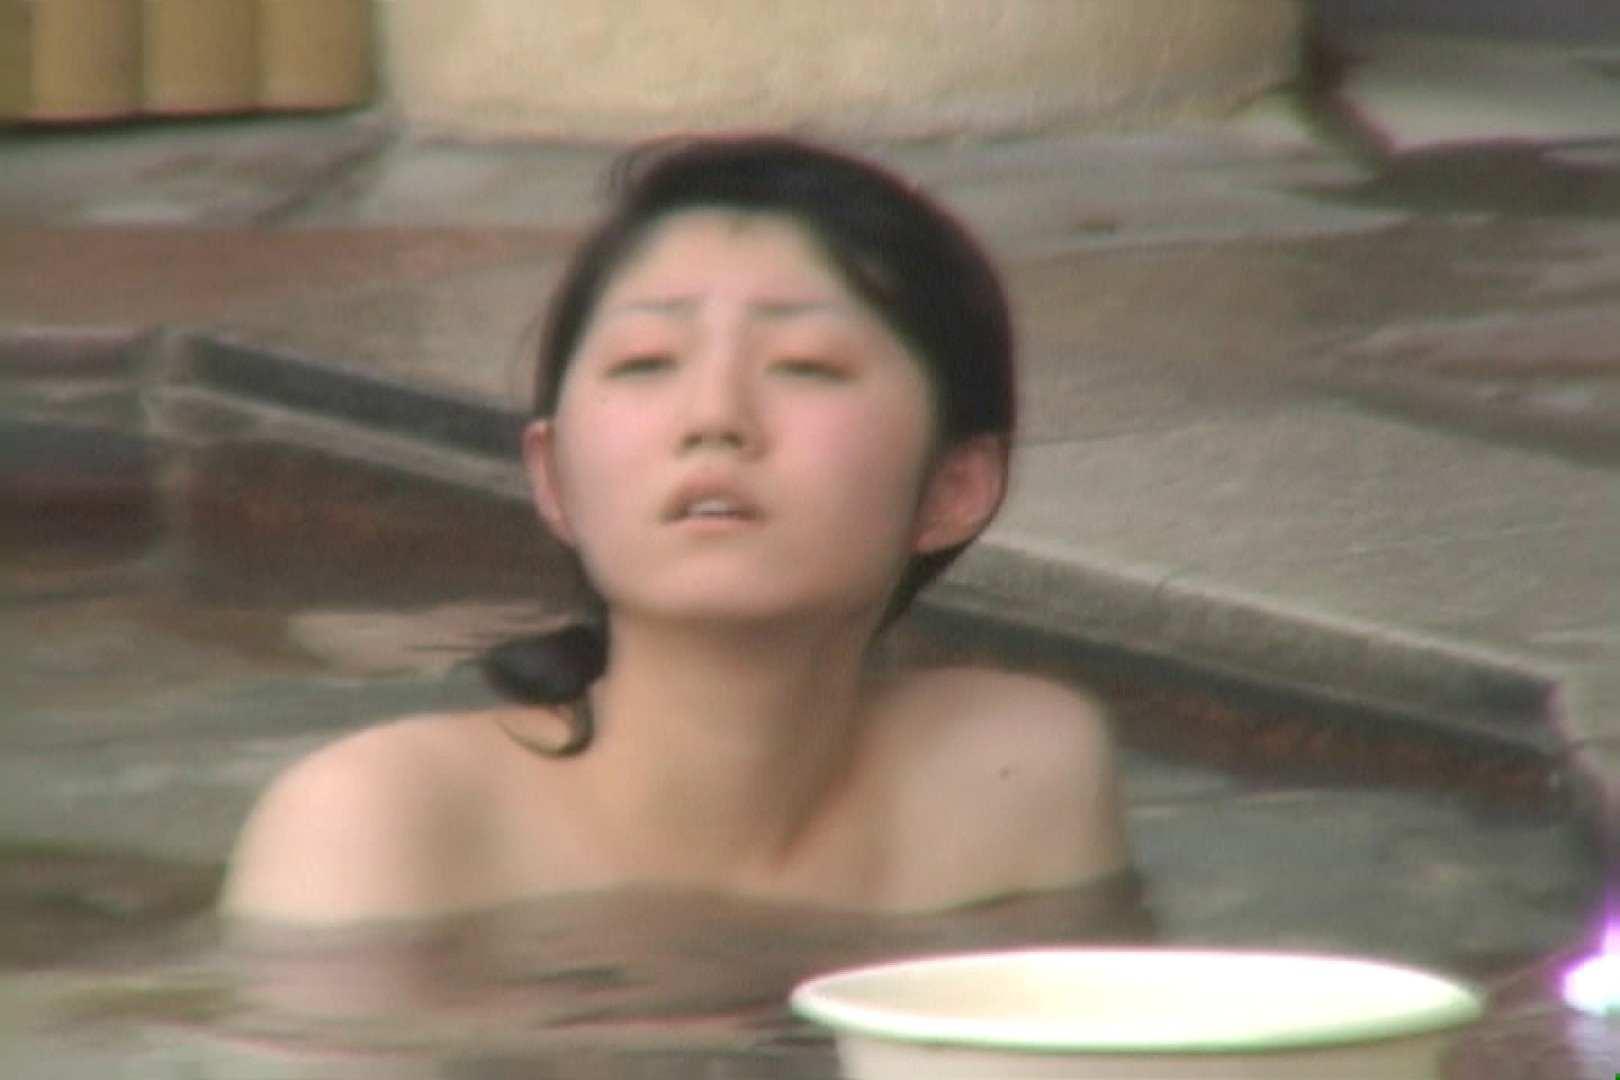 Aquaな露天風呂Vol.579 露天 | OLセックス  52画像 28